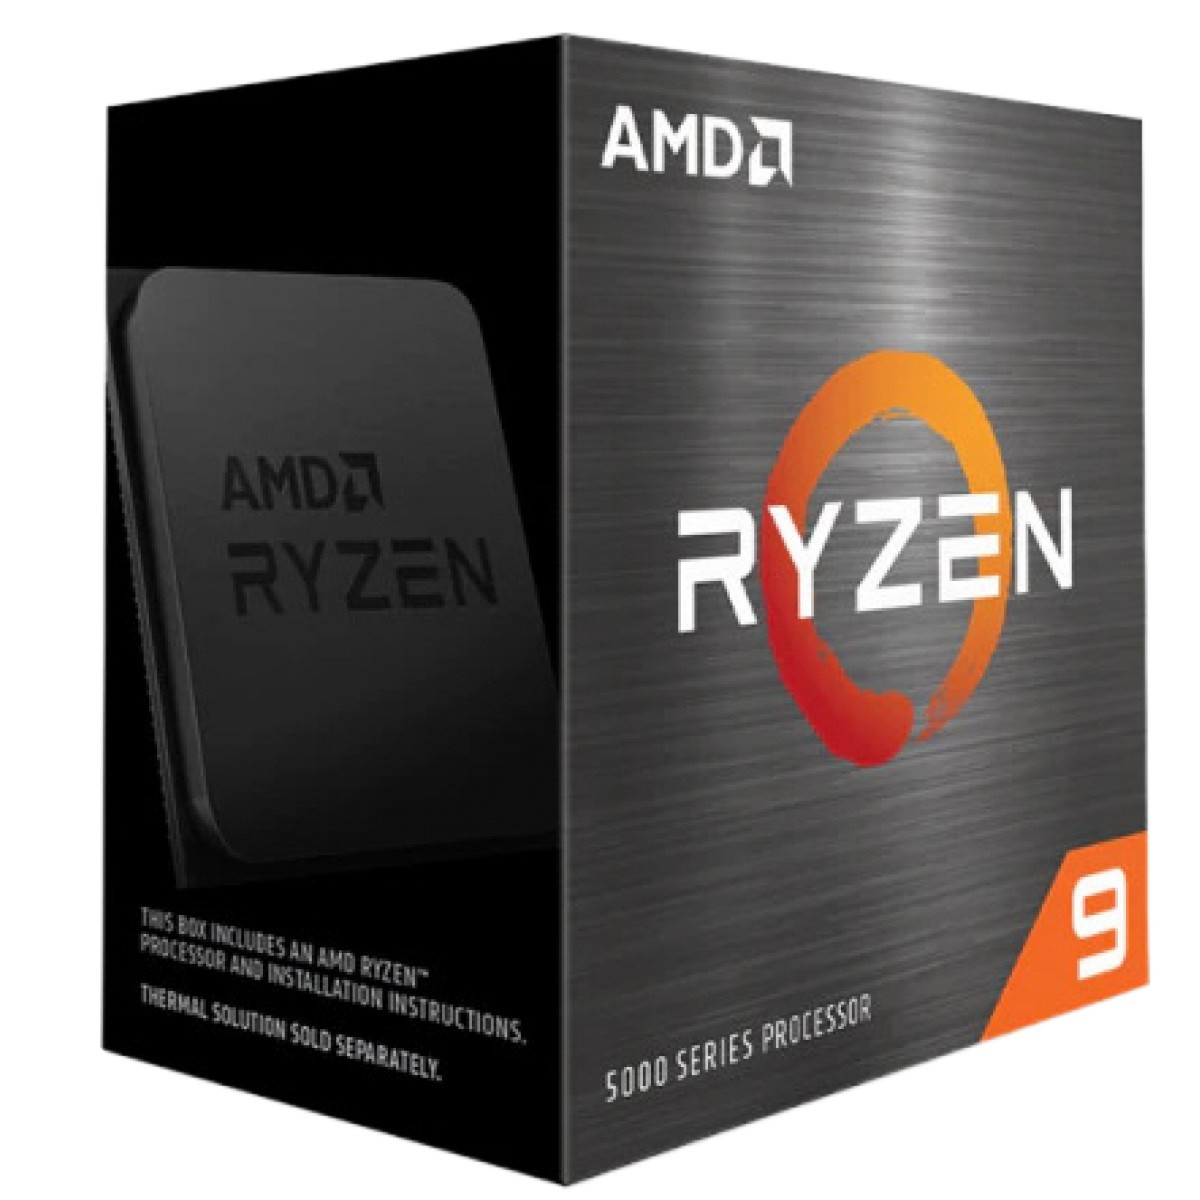 Kit Upgrade PowerColor RX 580 Red Devil + AMD Ryzen 9 5900X + Brinde Jogo Dirt 5